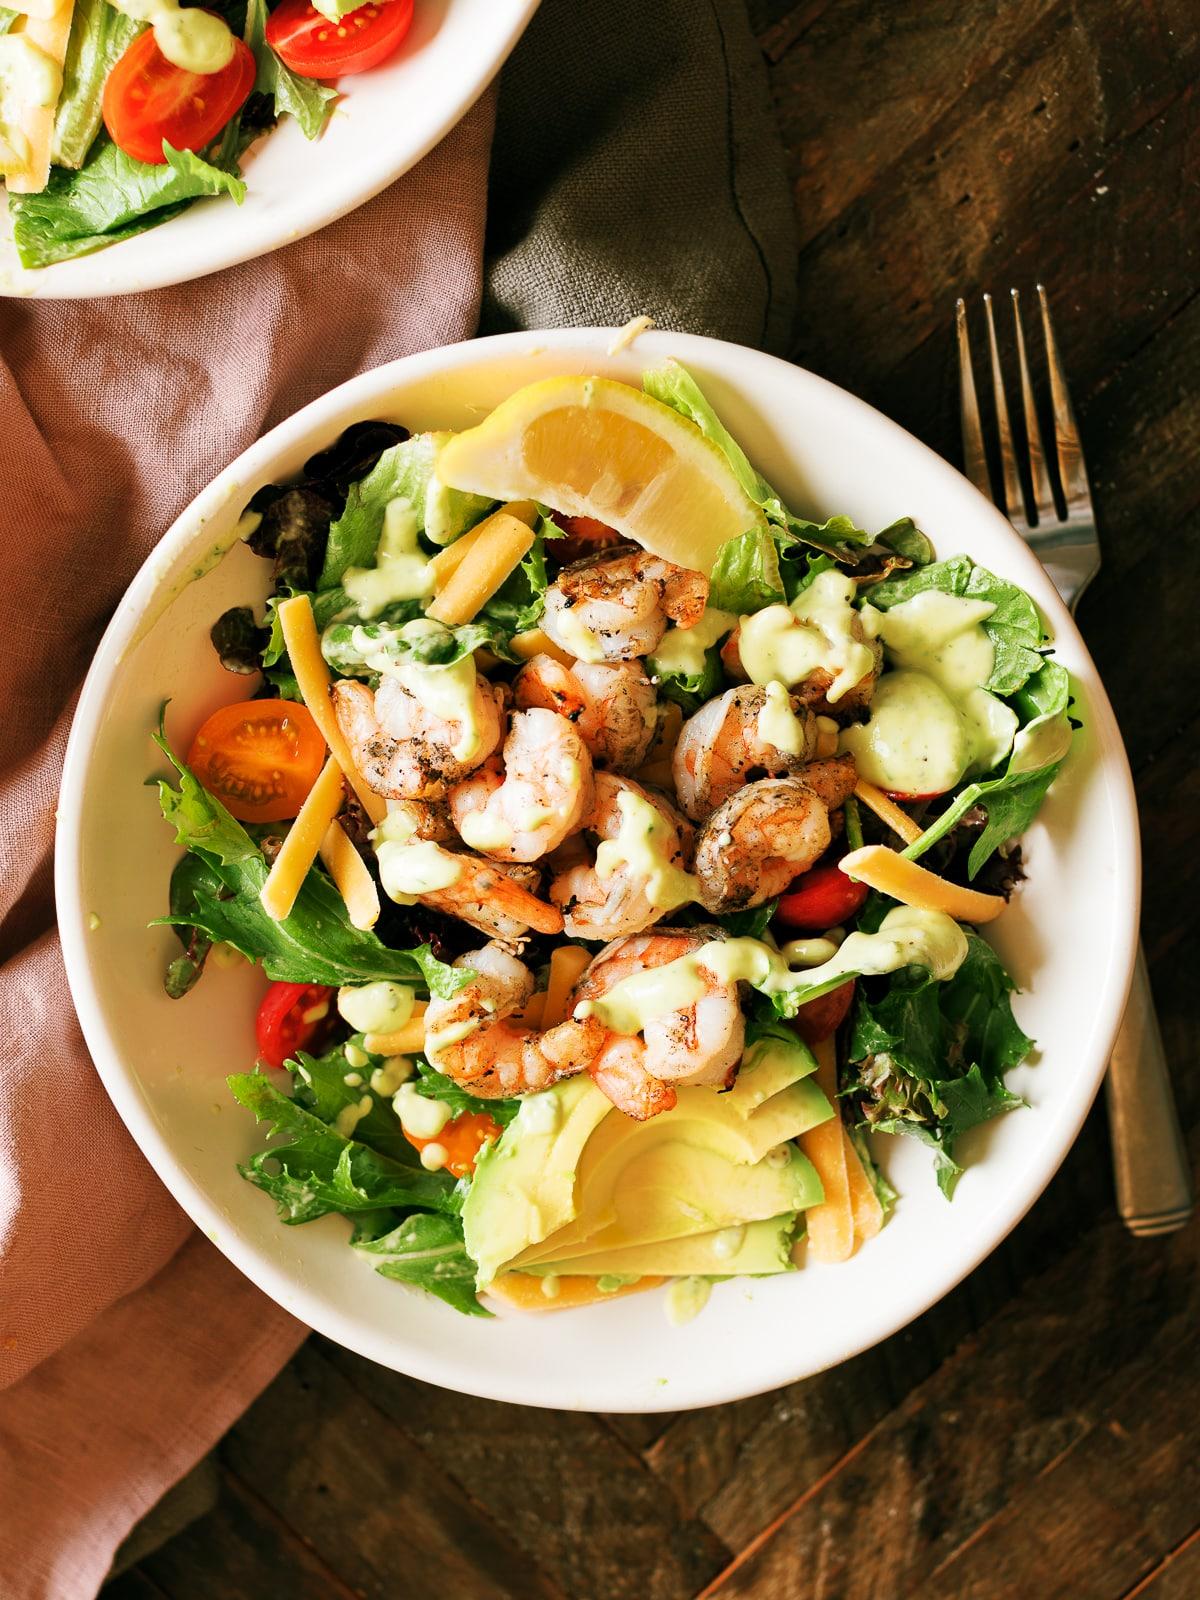 Grilled Shrimp Salad with Citrus Avocado Dressing